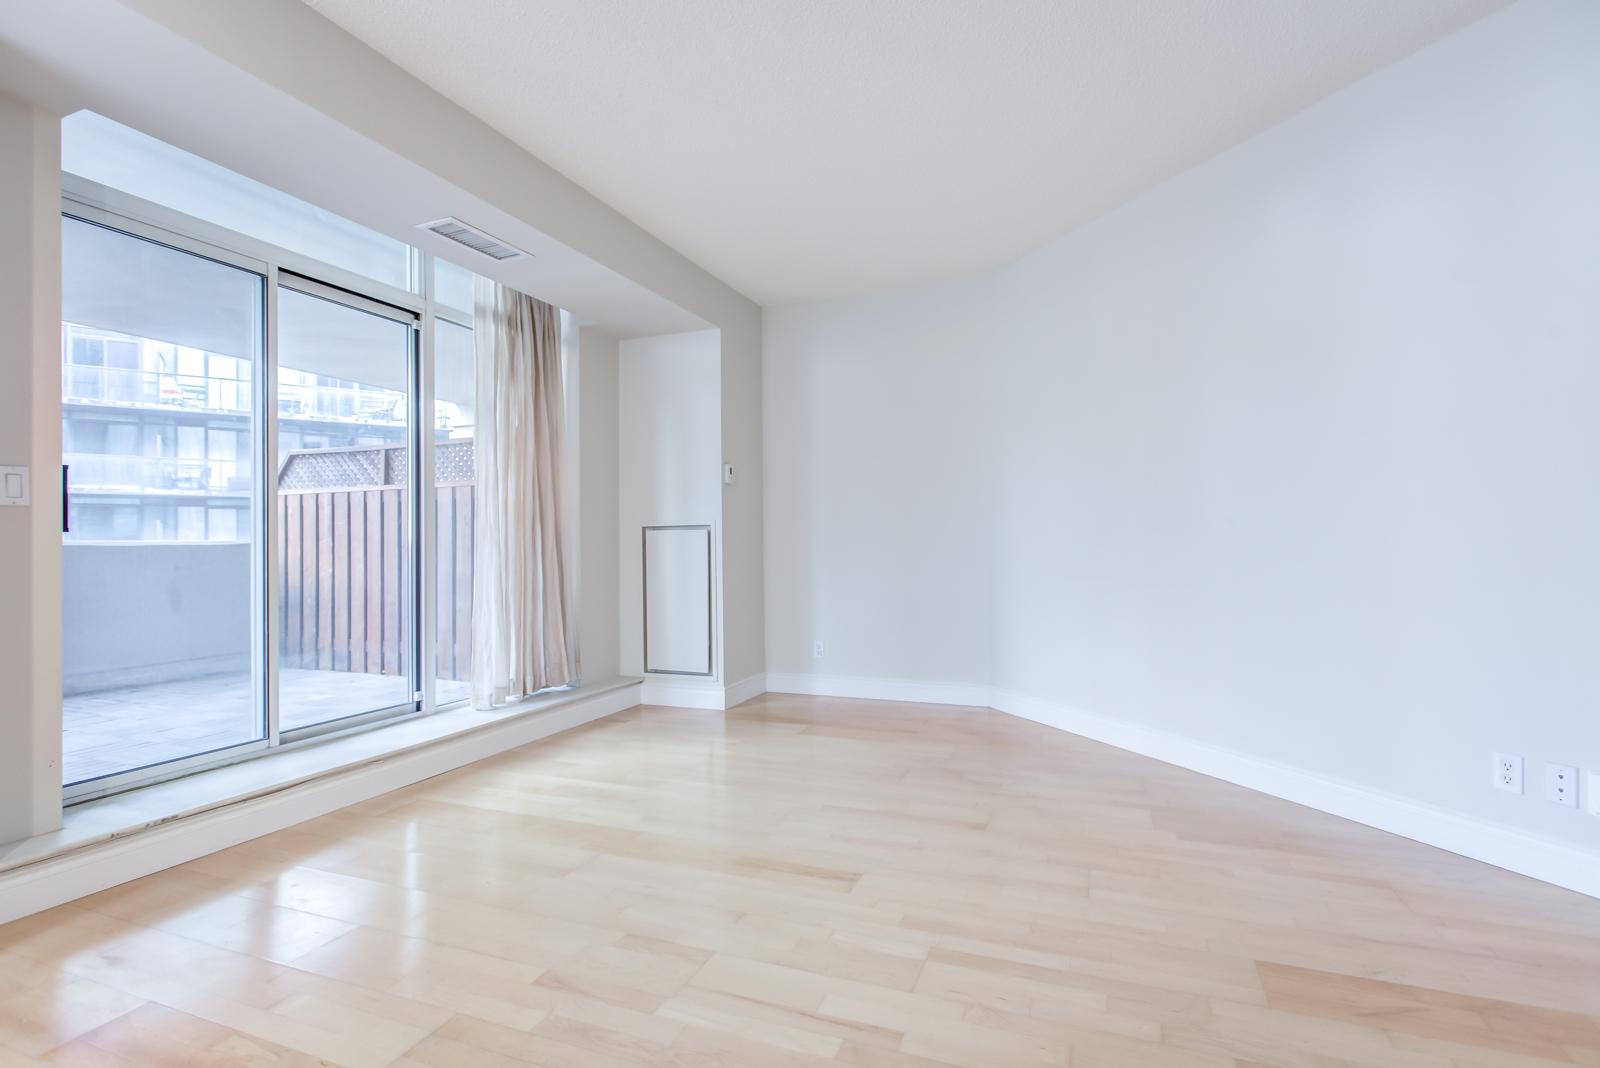 Empty living room with view of balcony through screen doors.